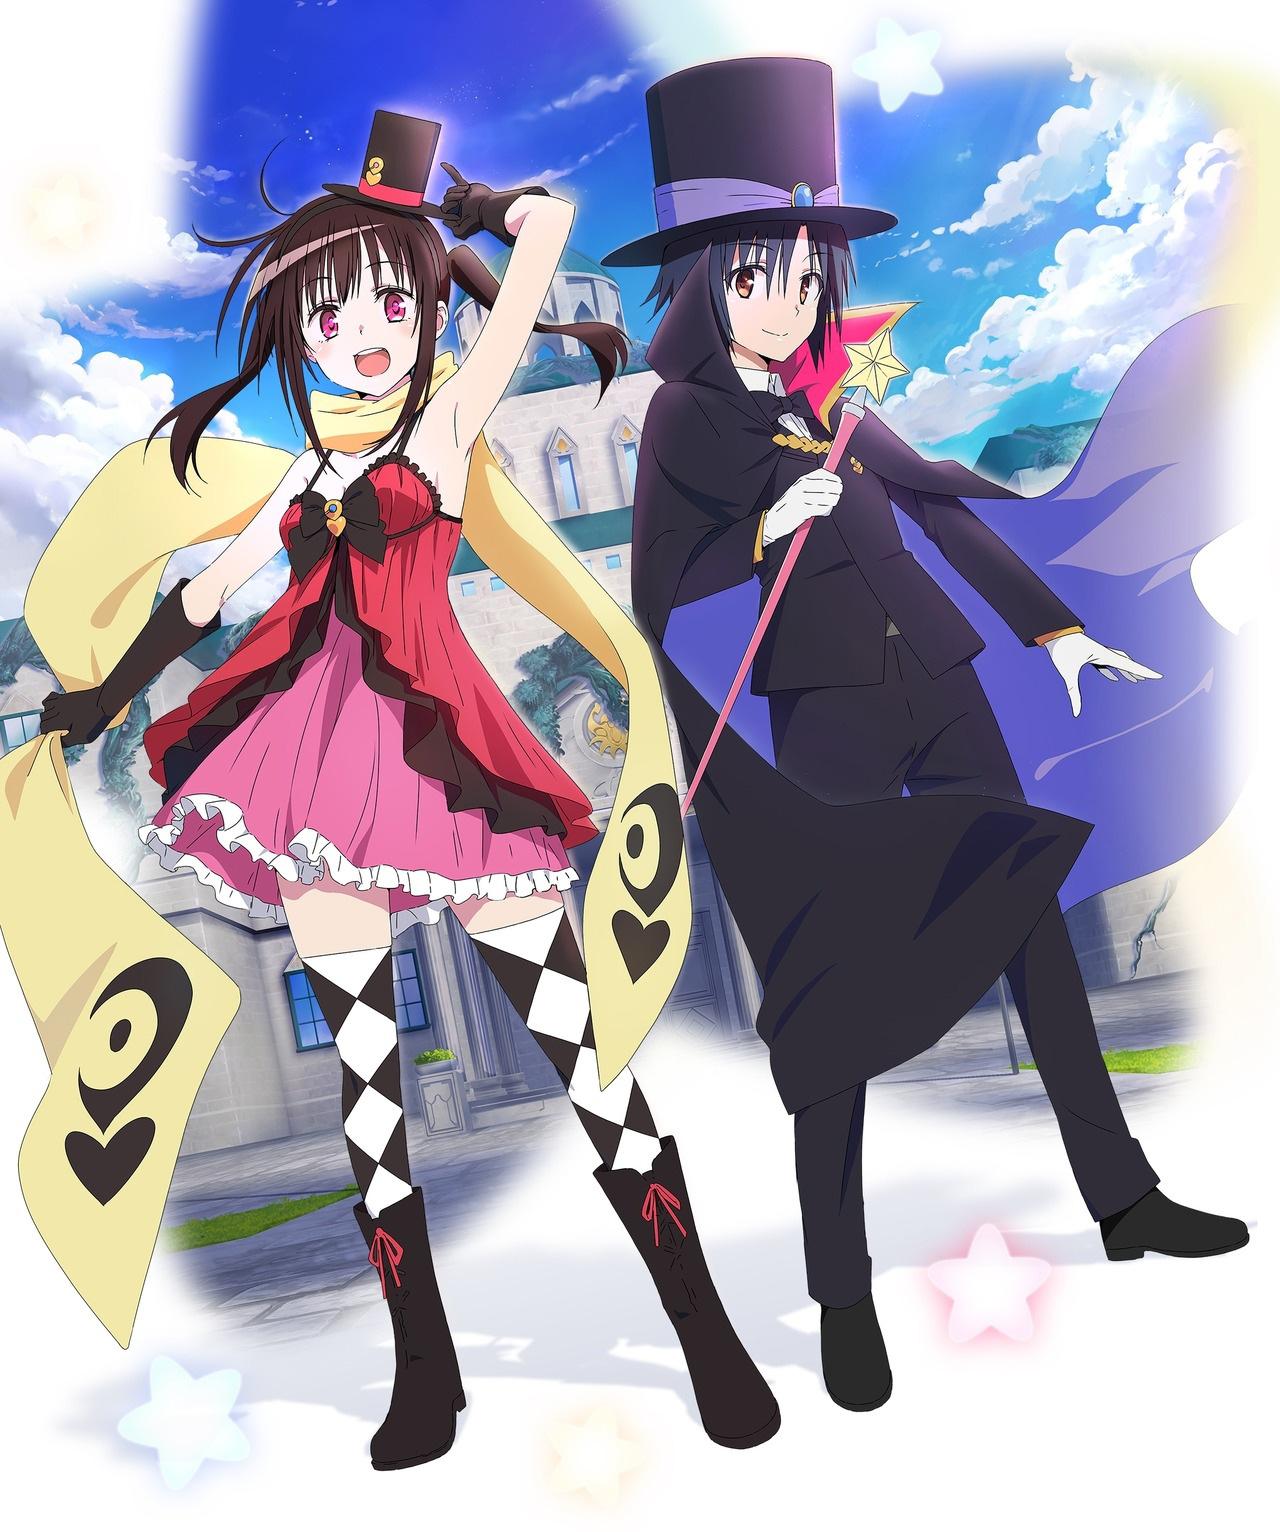 Imagem promocional da série anime Hatena Illusion